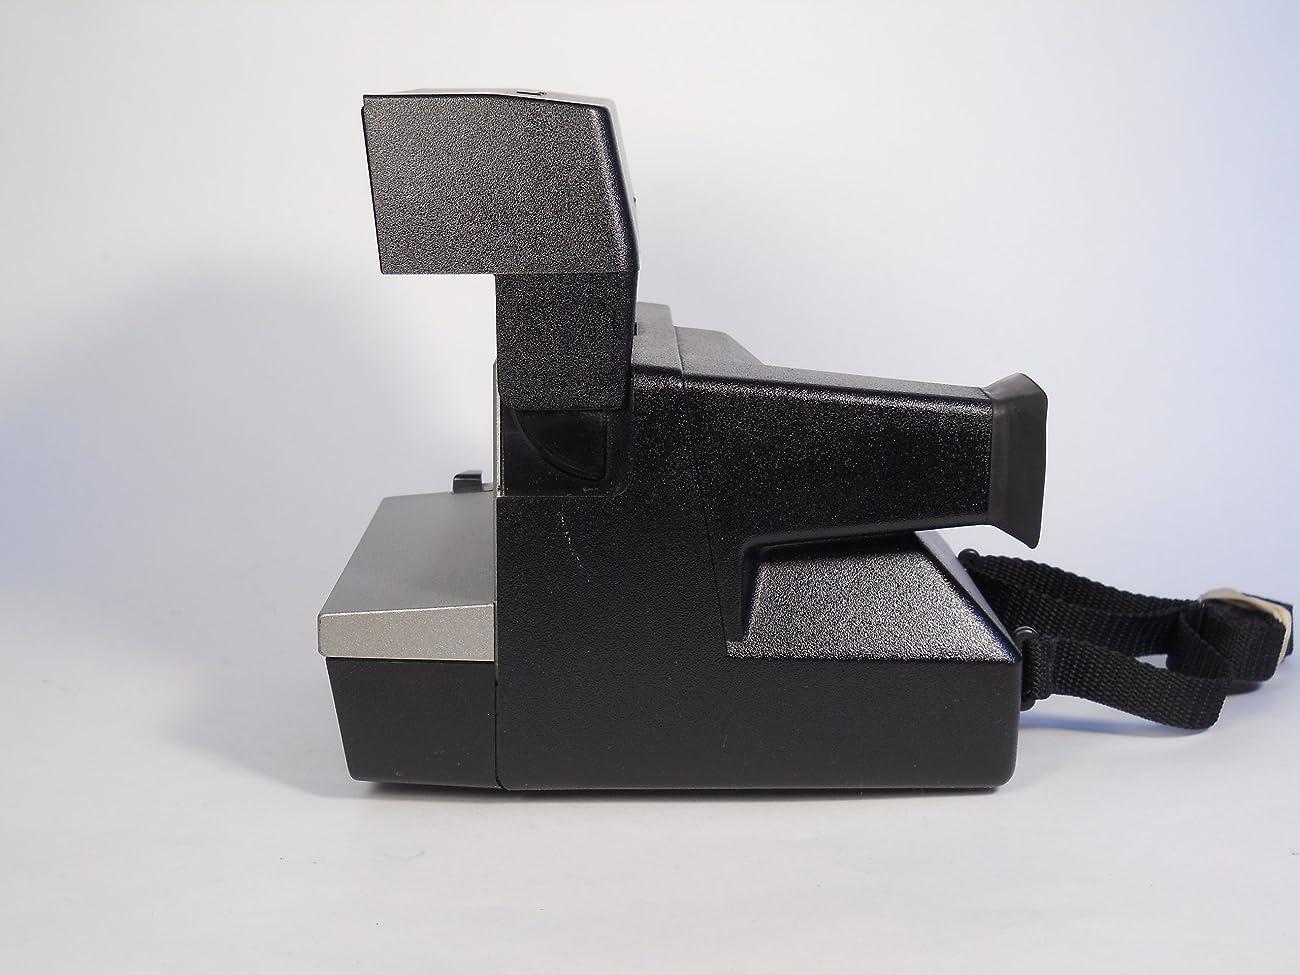 Polaroid Spirit 600 Vintage Instant Camera w/ Silver/Gray Front 3